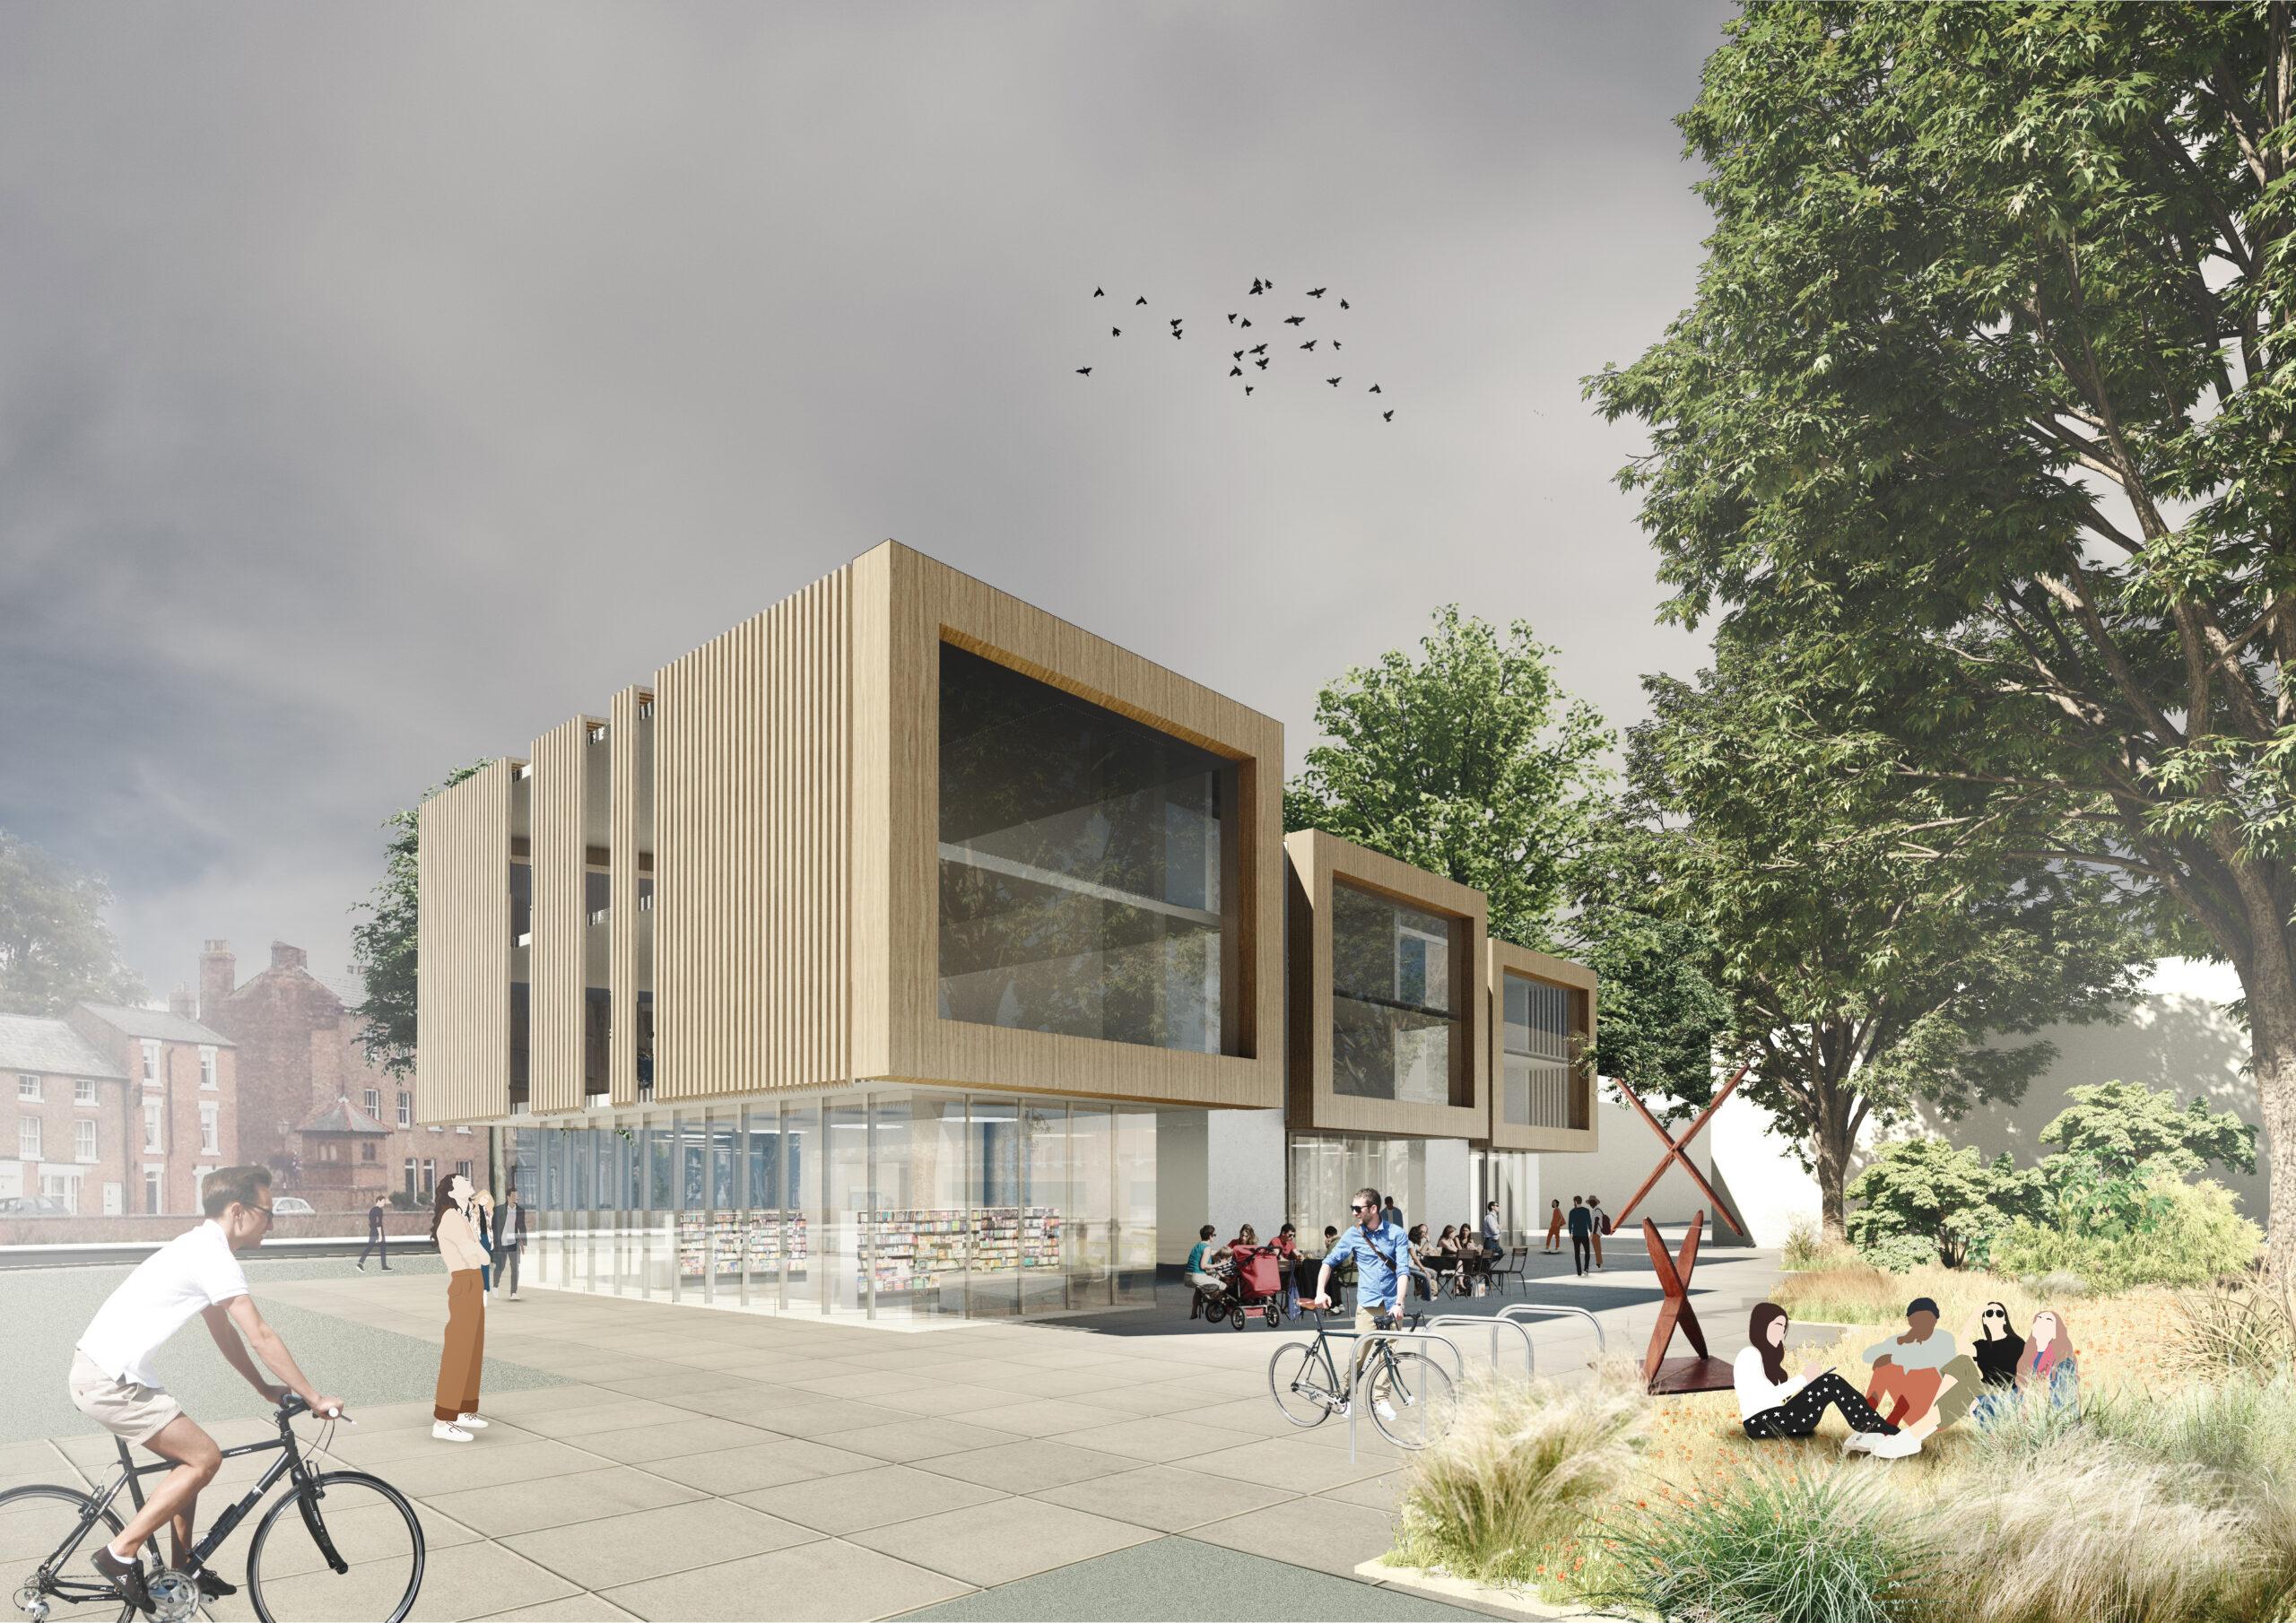 New build flats, shops, public square